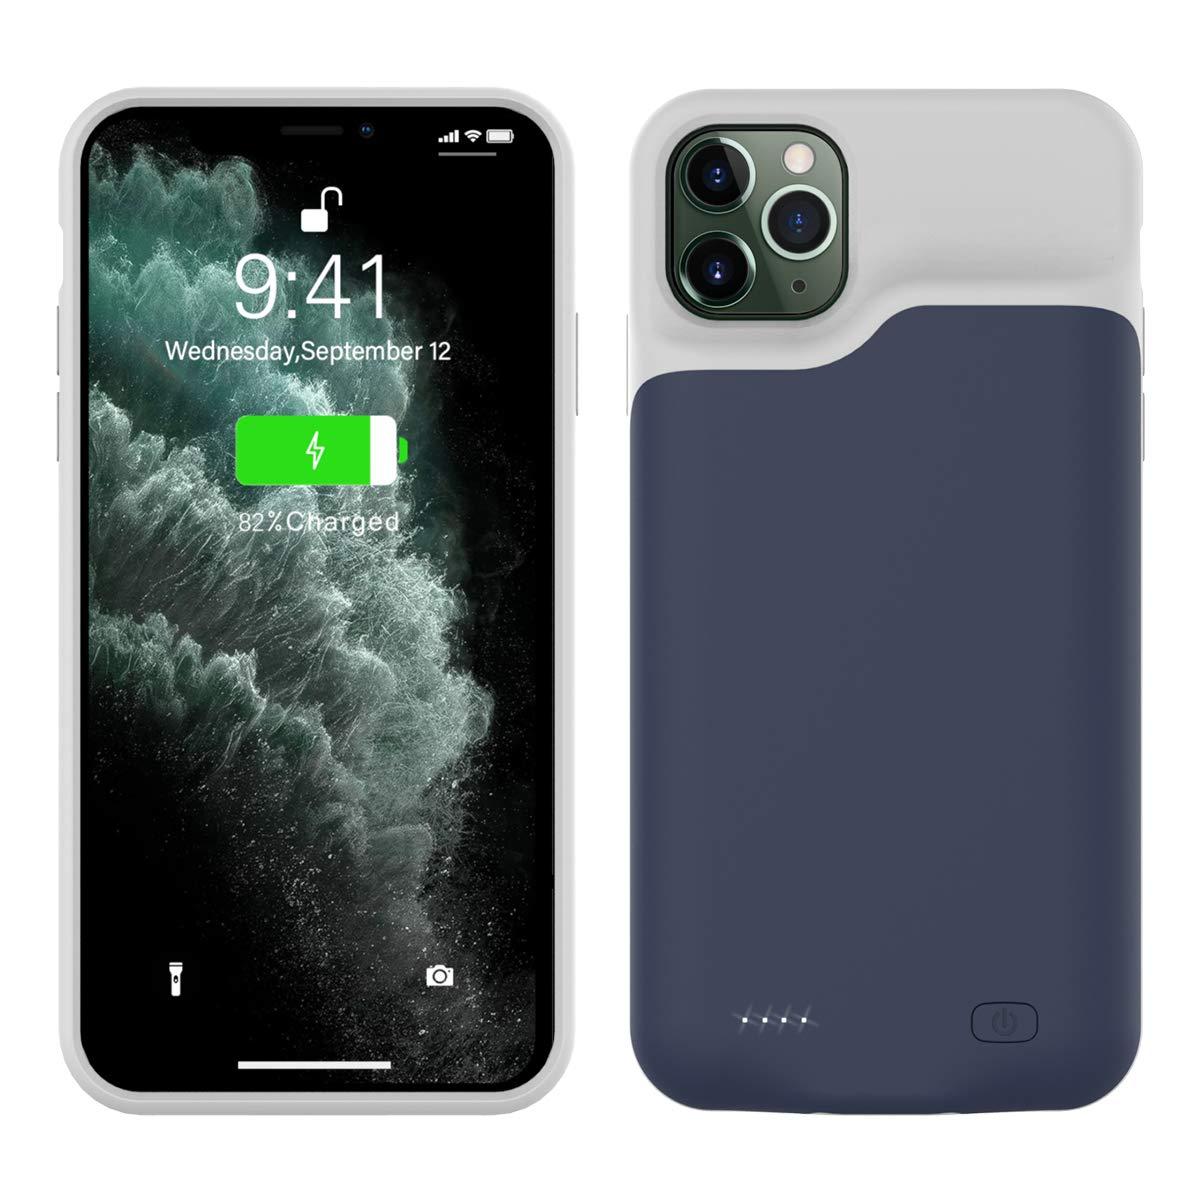 Bater/ía Cargador Externa para iPhone 11 Pro MAX 6.5 Inch Battery Black CASEWRS Funda Bater/ía para iPhone 11 Pro MAX 6.5 Inch Battery Recargable Backup Charger Case Port/átil Power Bank Case